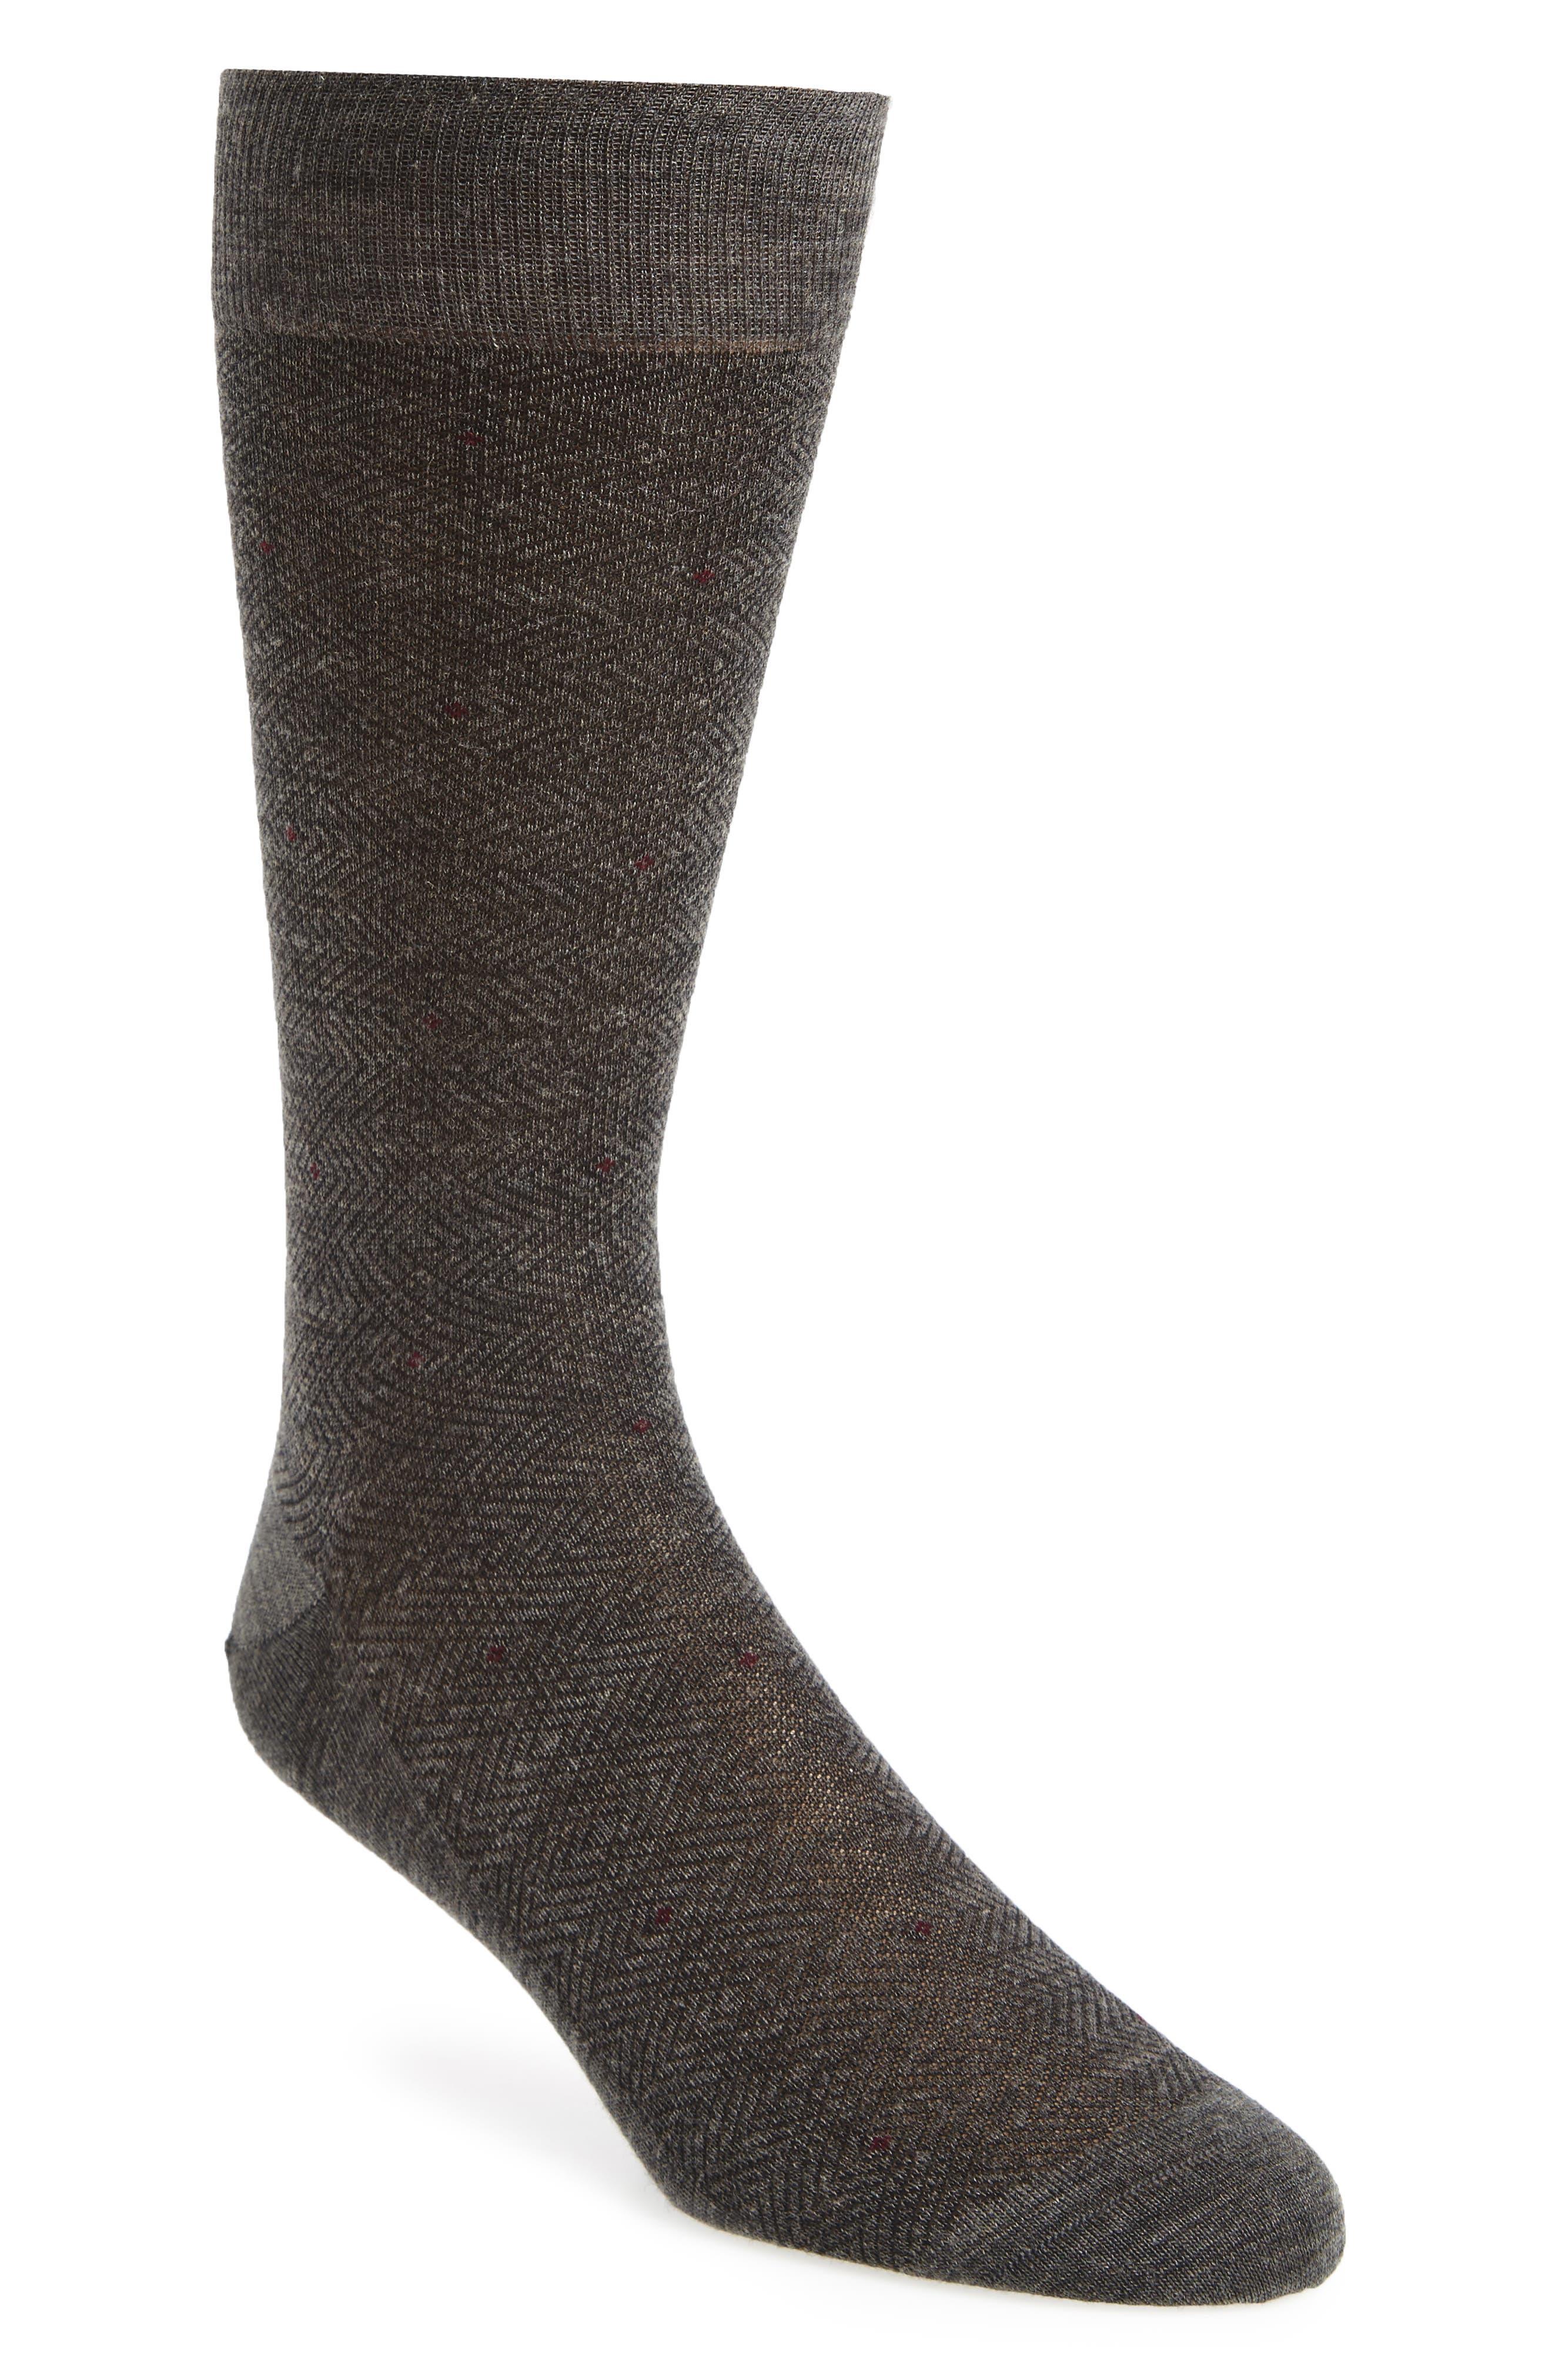 Merino Wool Blend Socks,                         Main,                         color, Mid Grey Mix